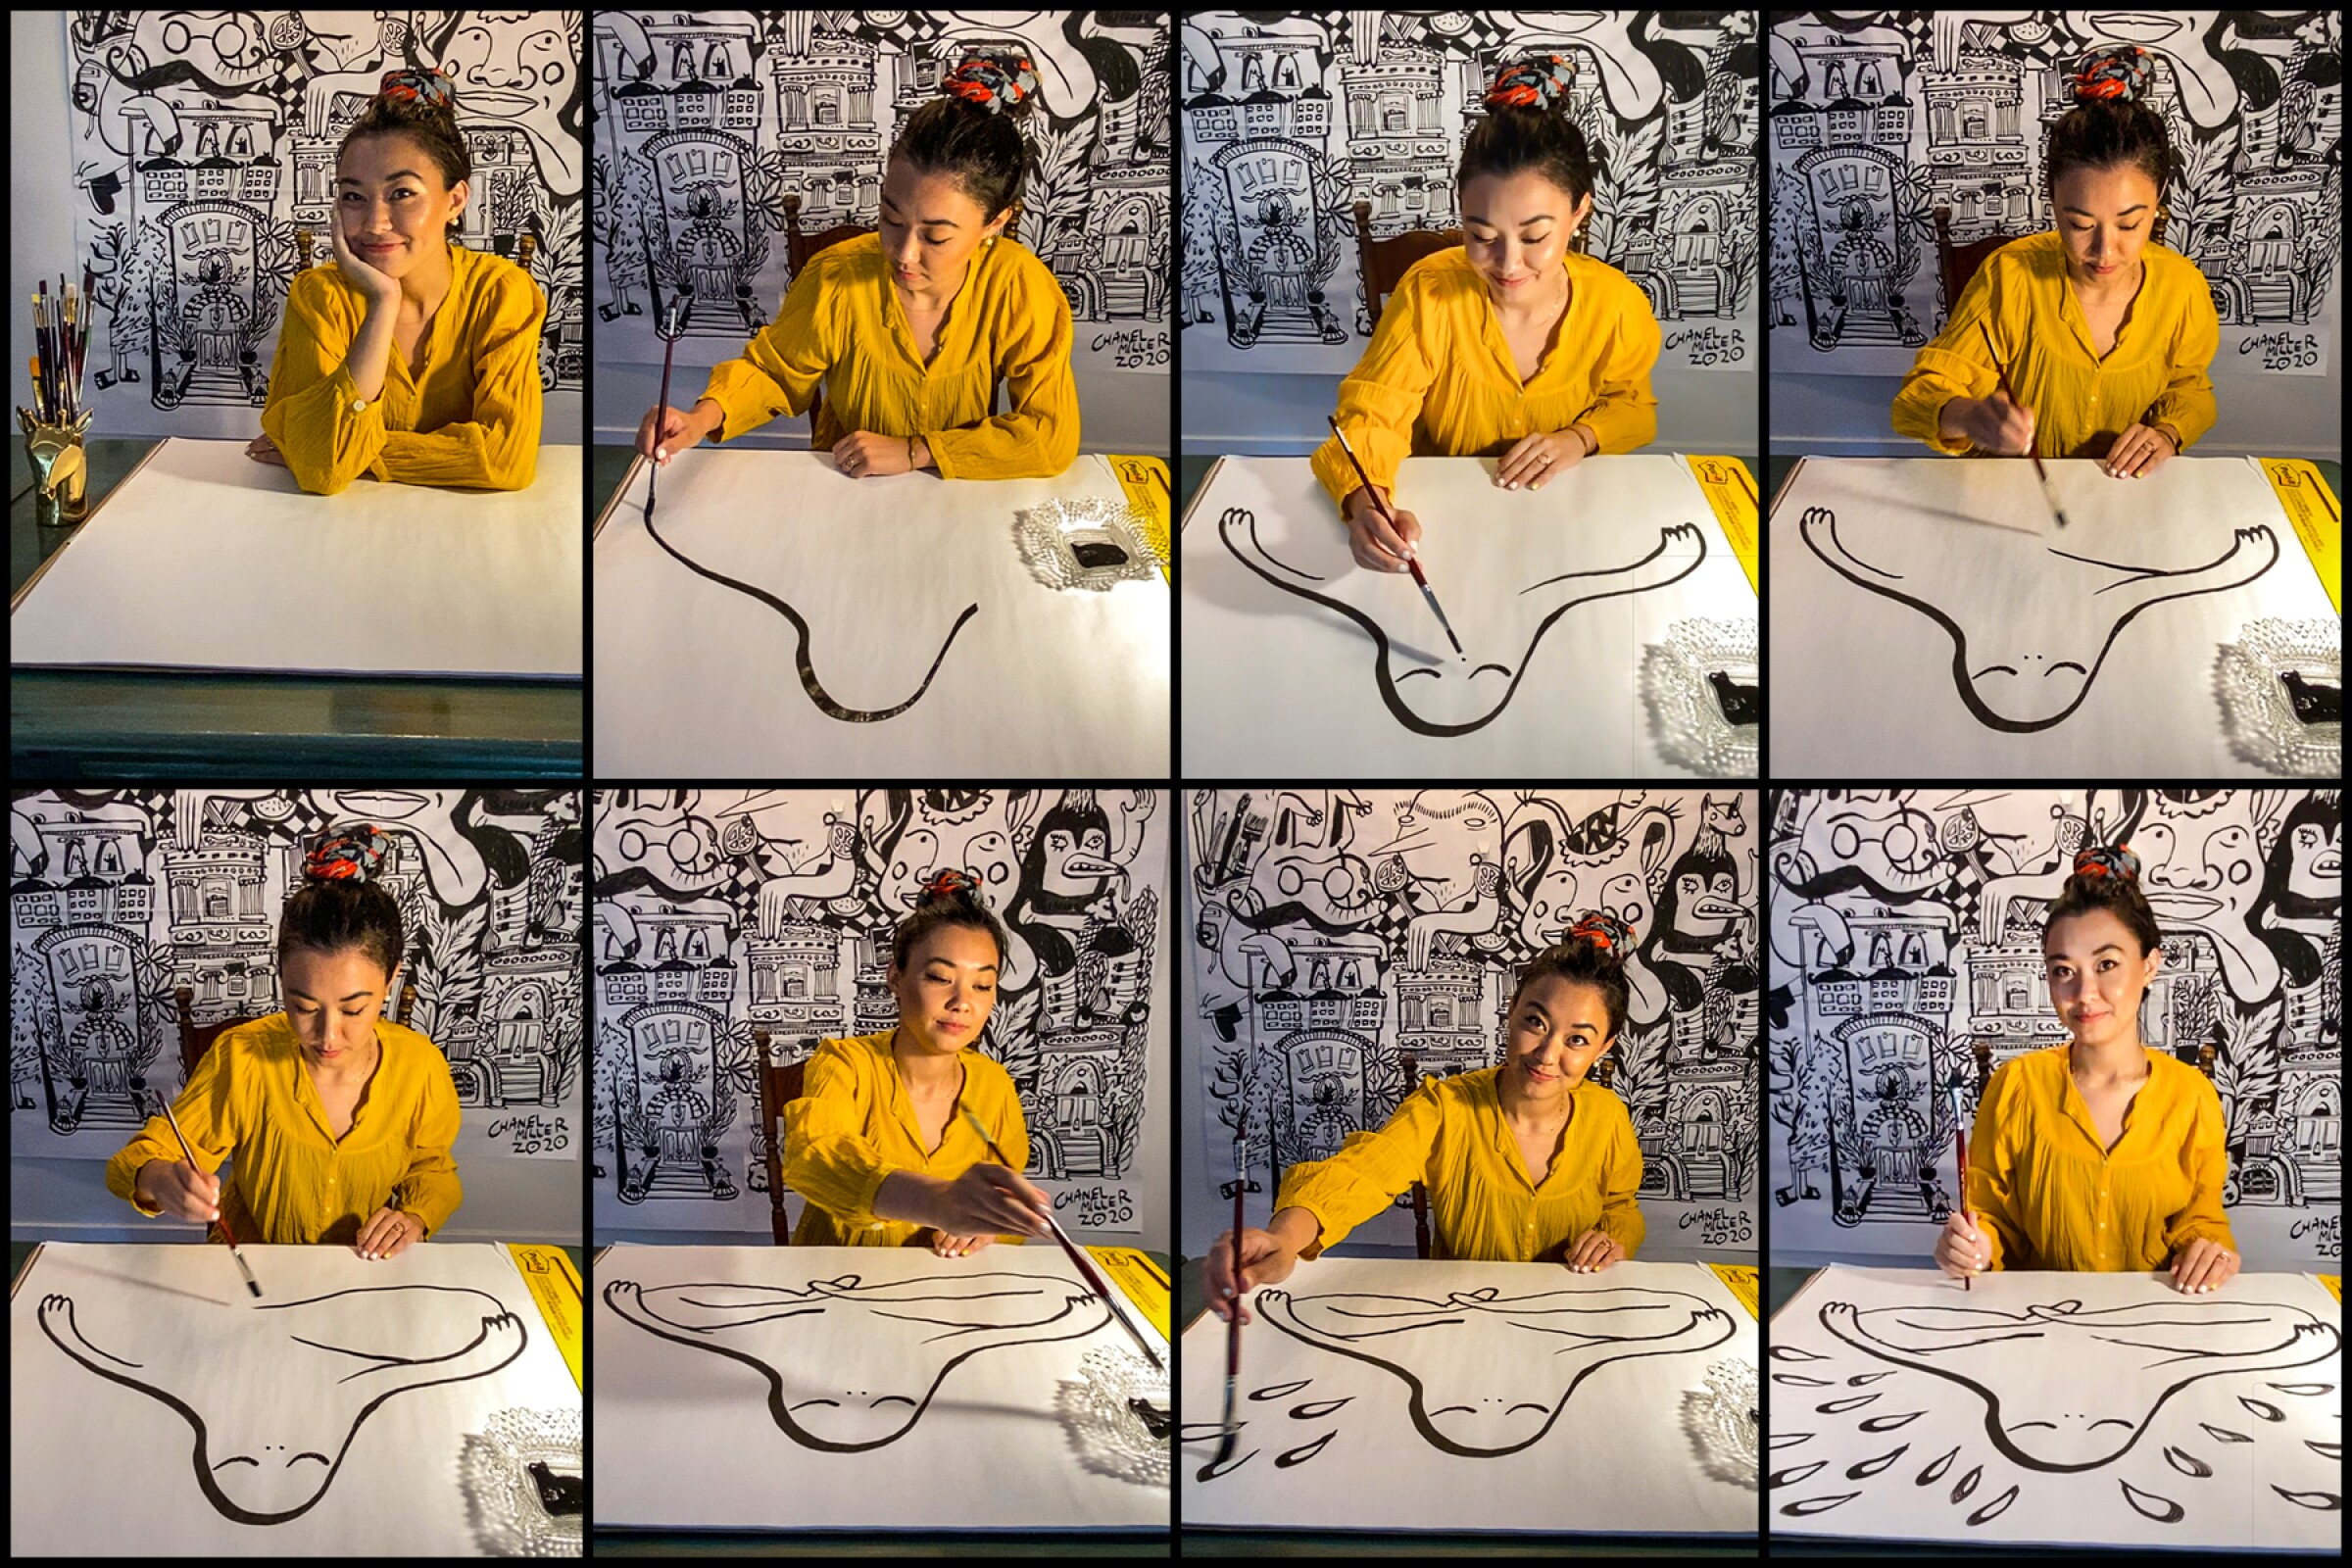 Chanel Miller demonstrates her art in a grid of screenshots taken via FaceTime on iPad.